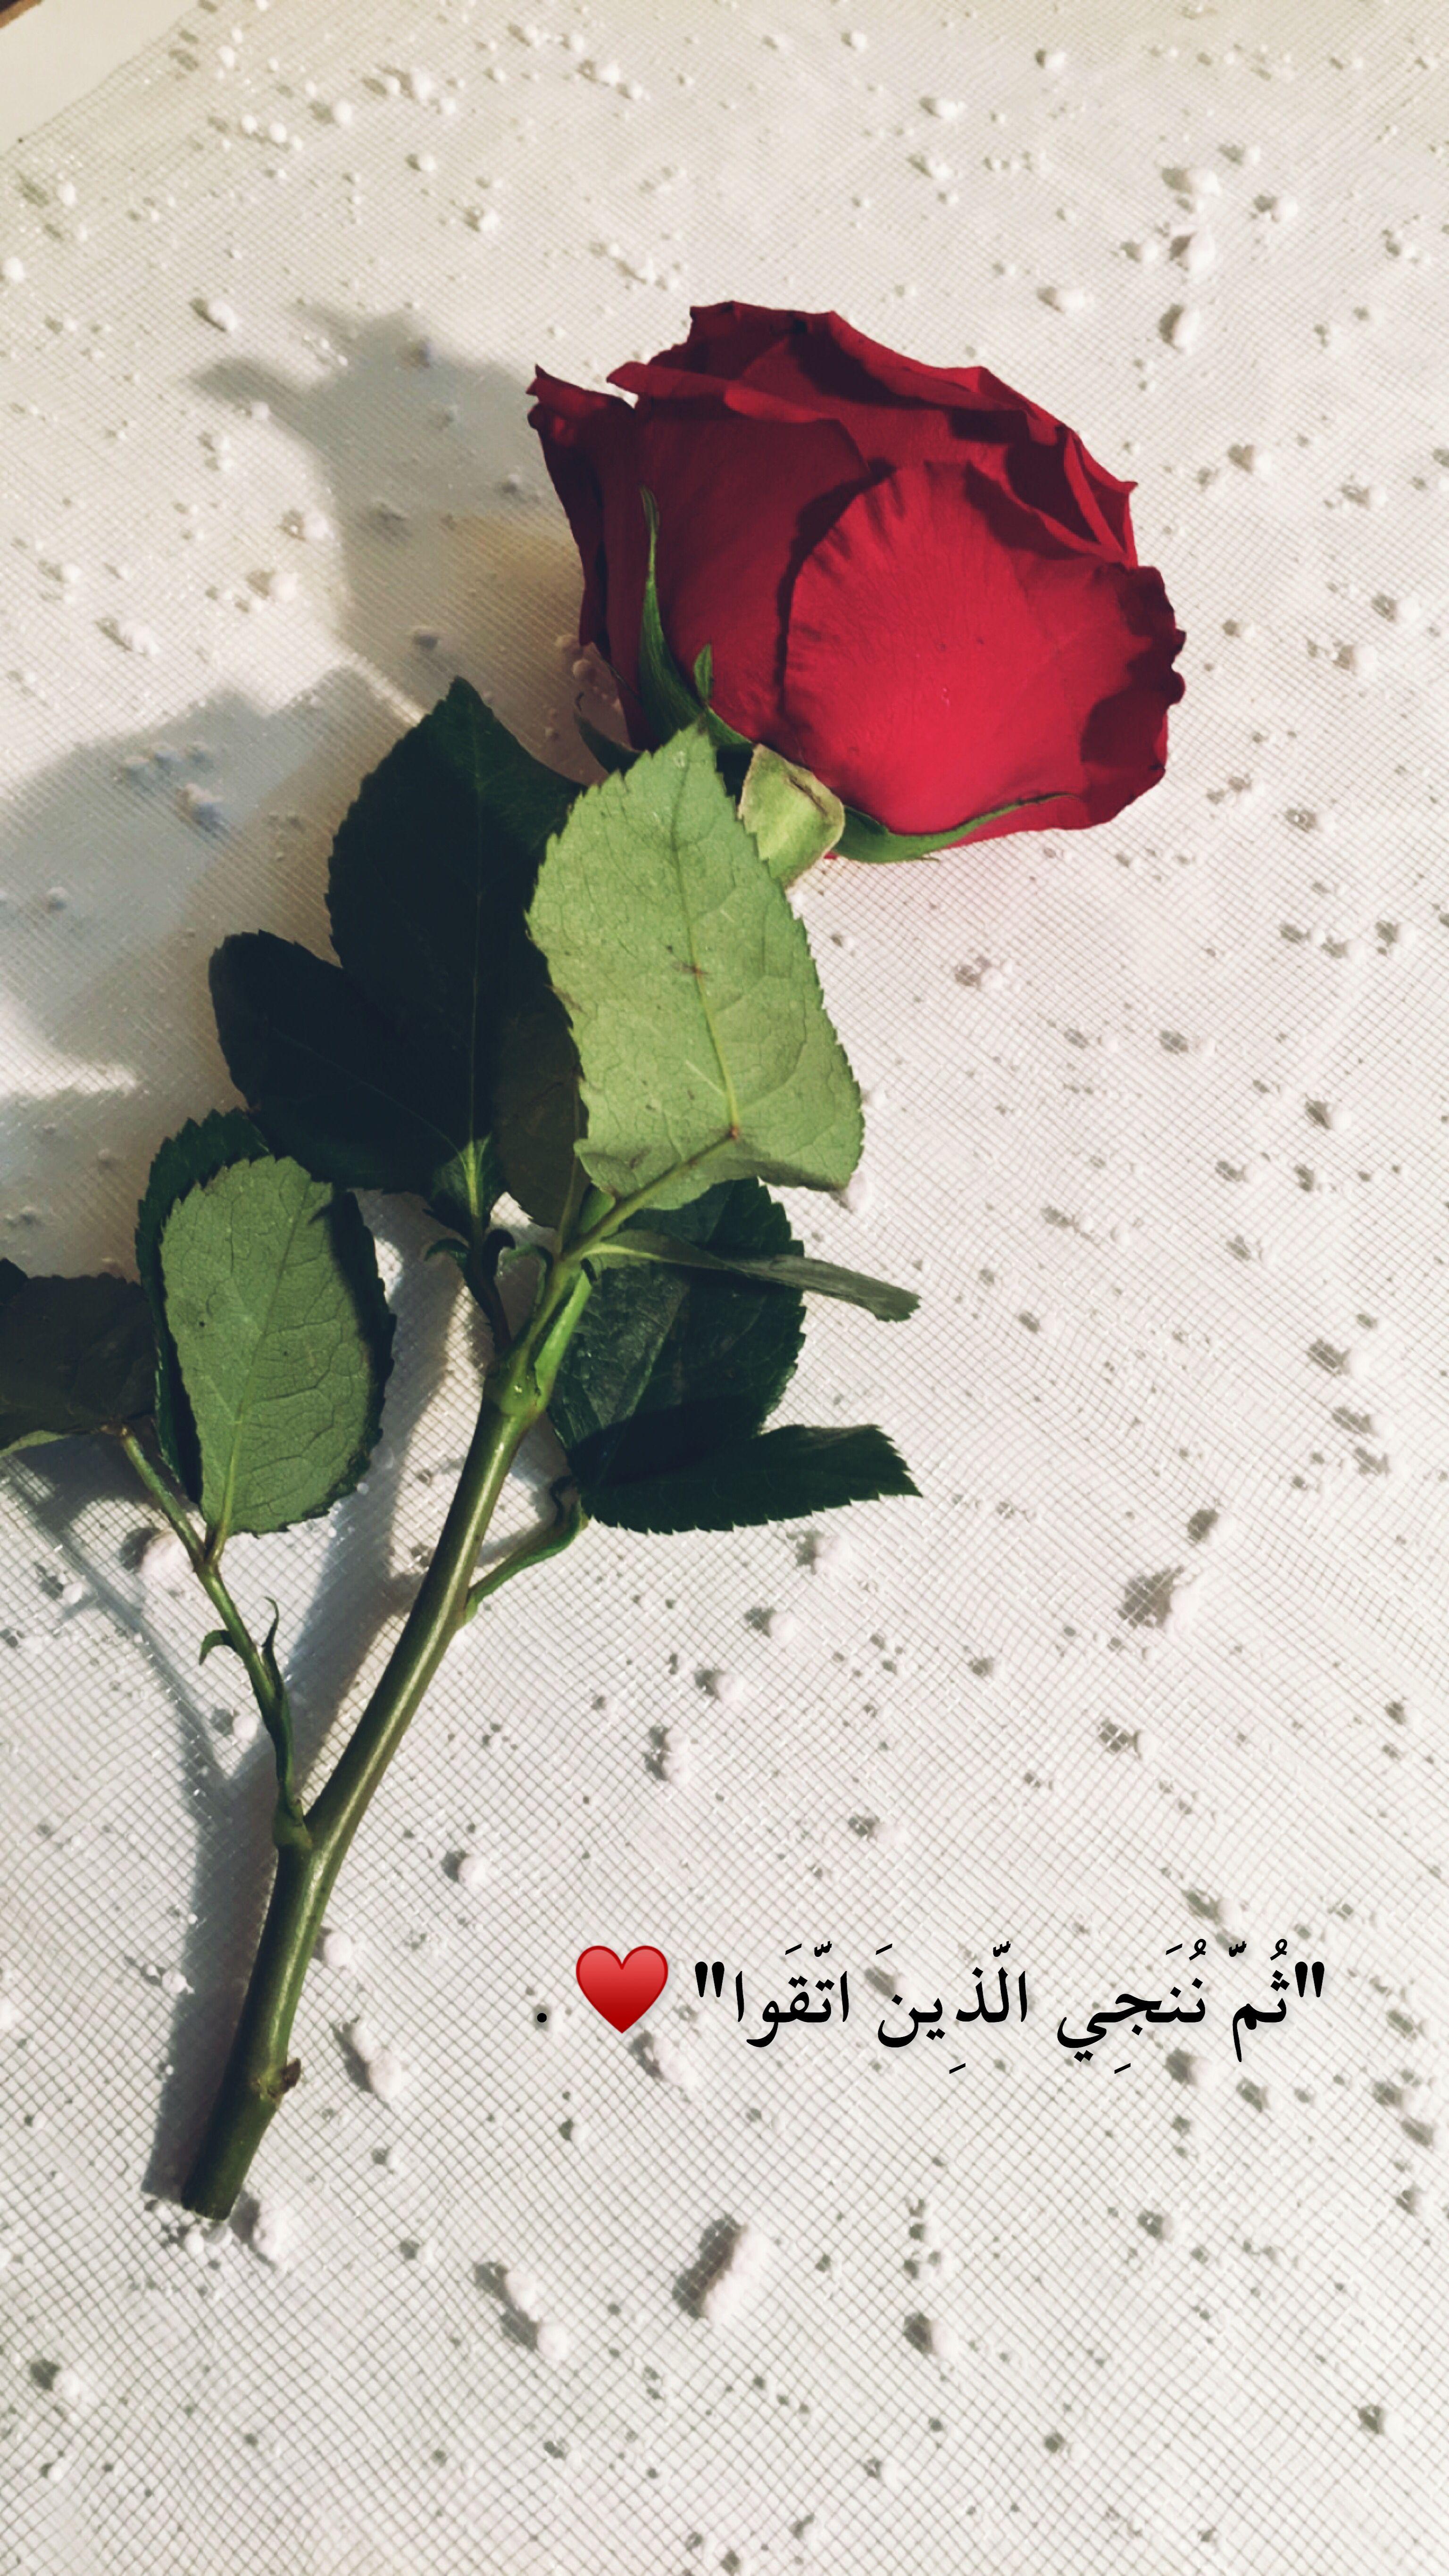 Snap Aissha111 سنابيات قهوتي صباح الخير يارب سنابي سنابك تصوير Beautiful Arabic Words Cover Photo Quotes Arabic Love Quotes